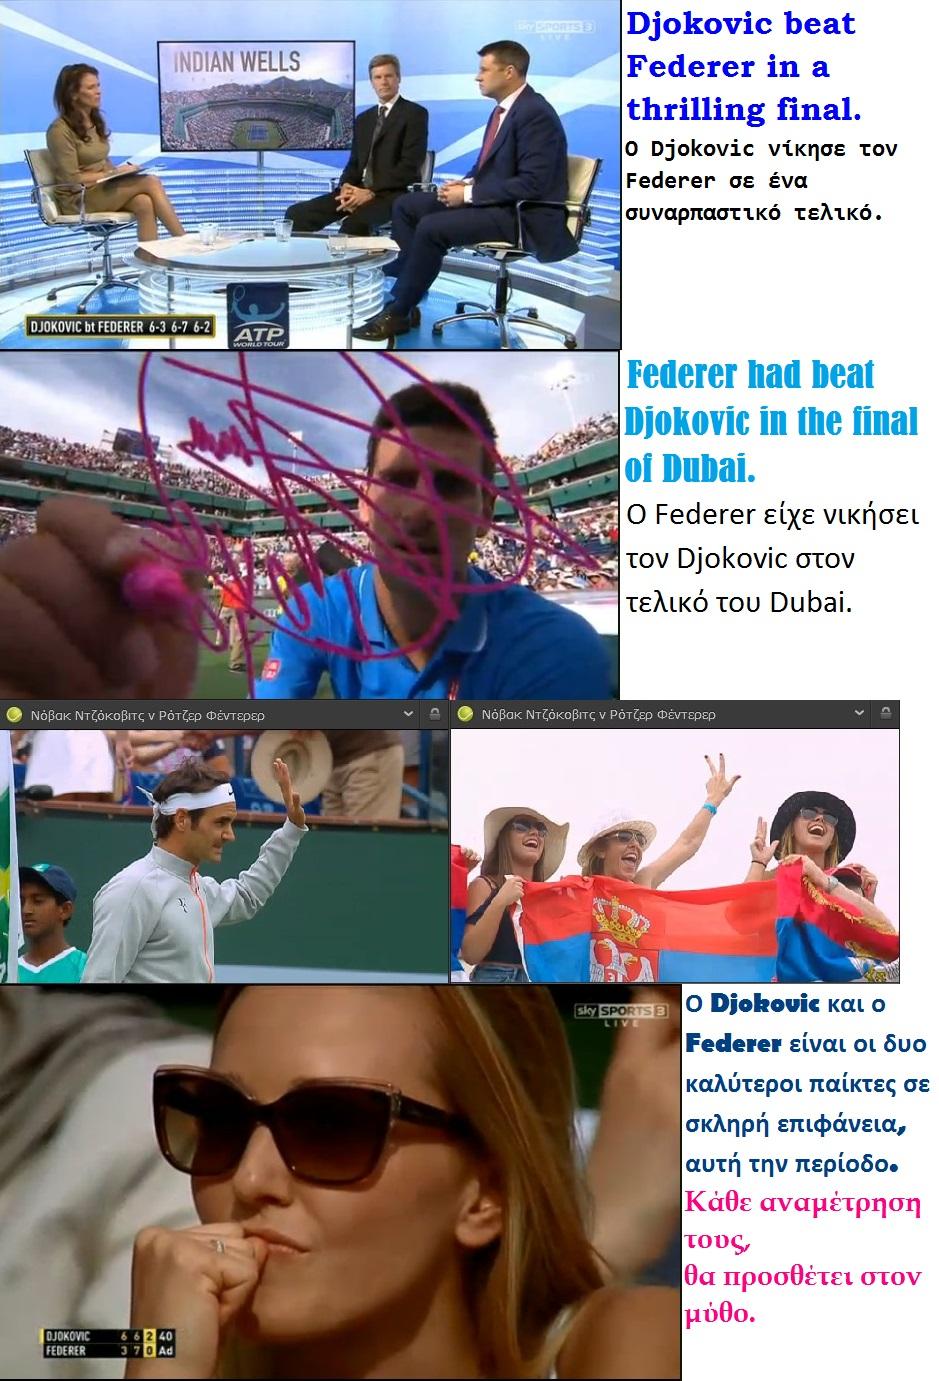 TENNIS ATP INDIAN WELLS FINAL DJOKOVIC WIN VS FEDERER 02 230315